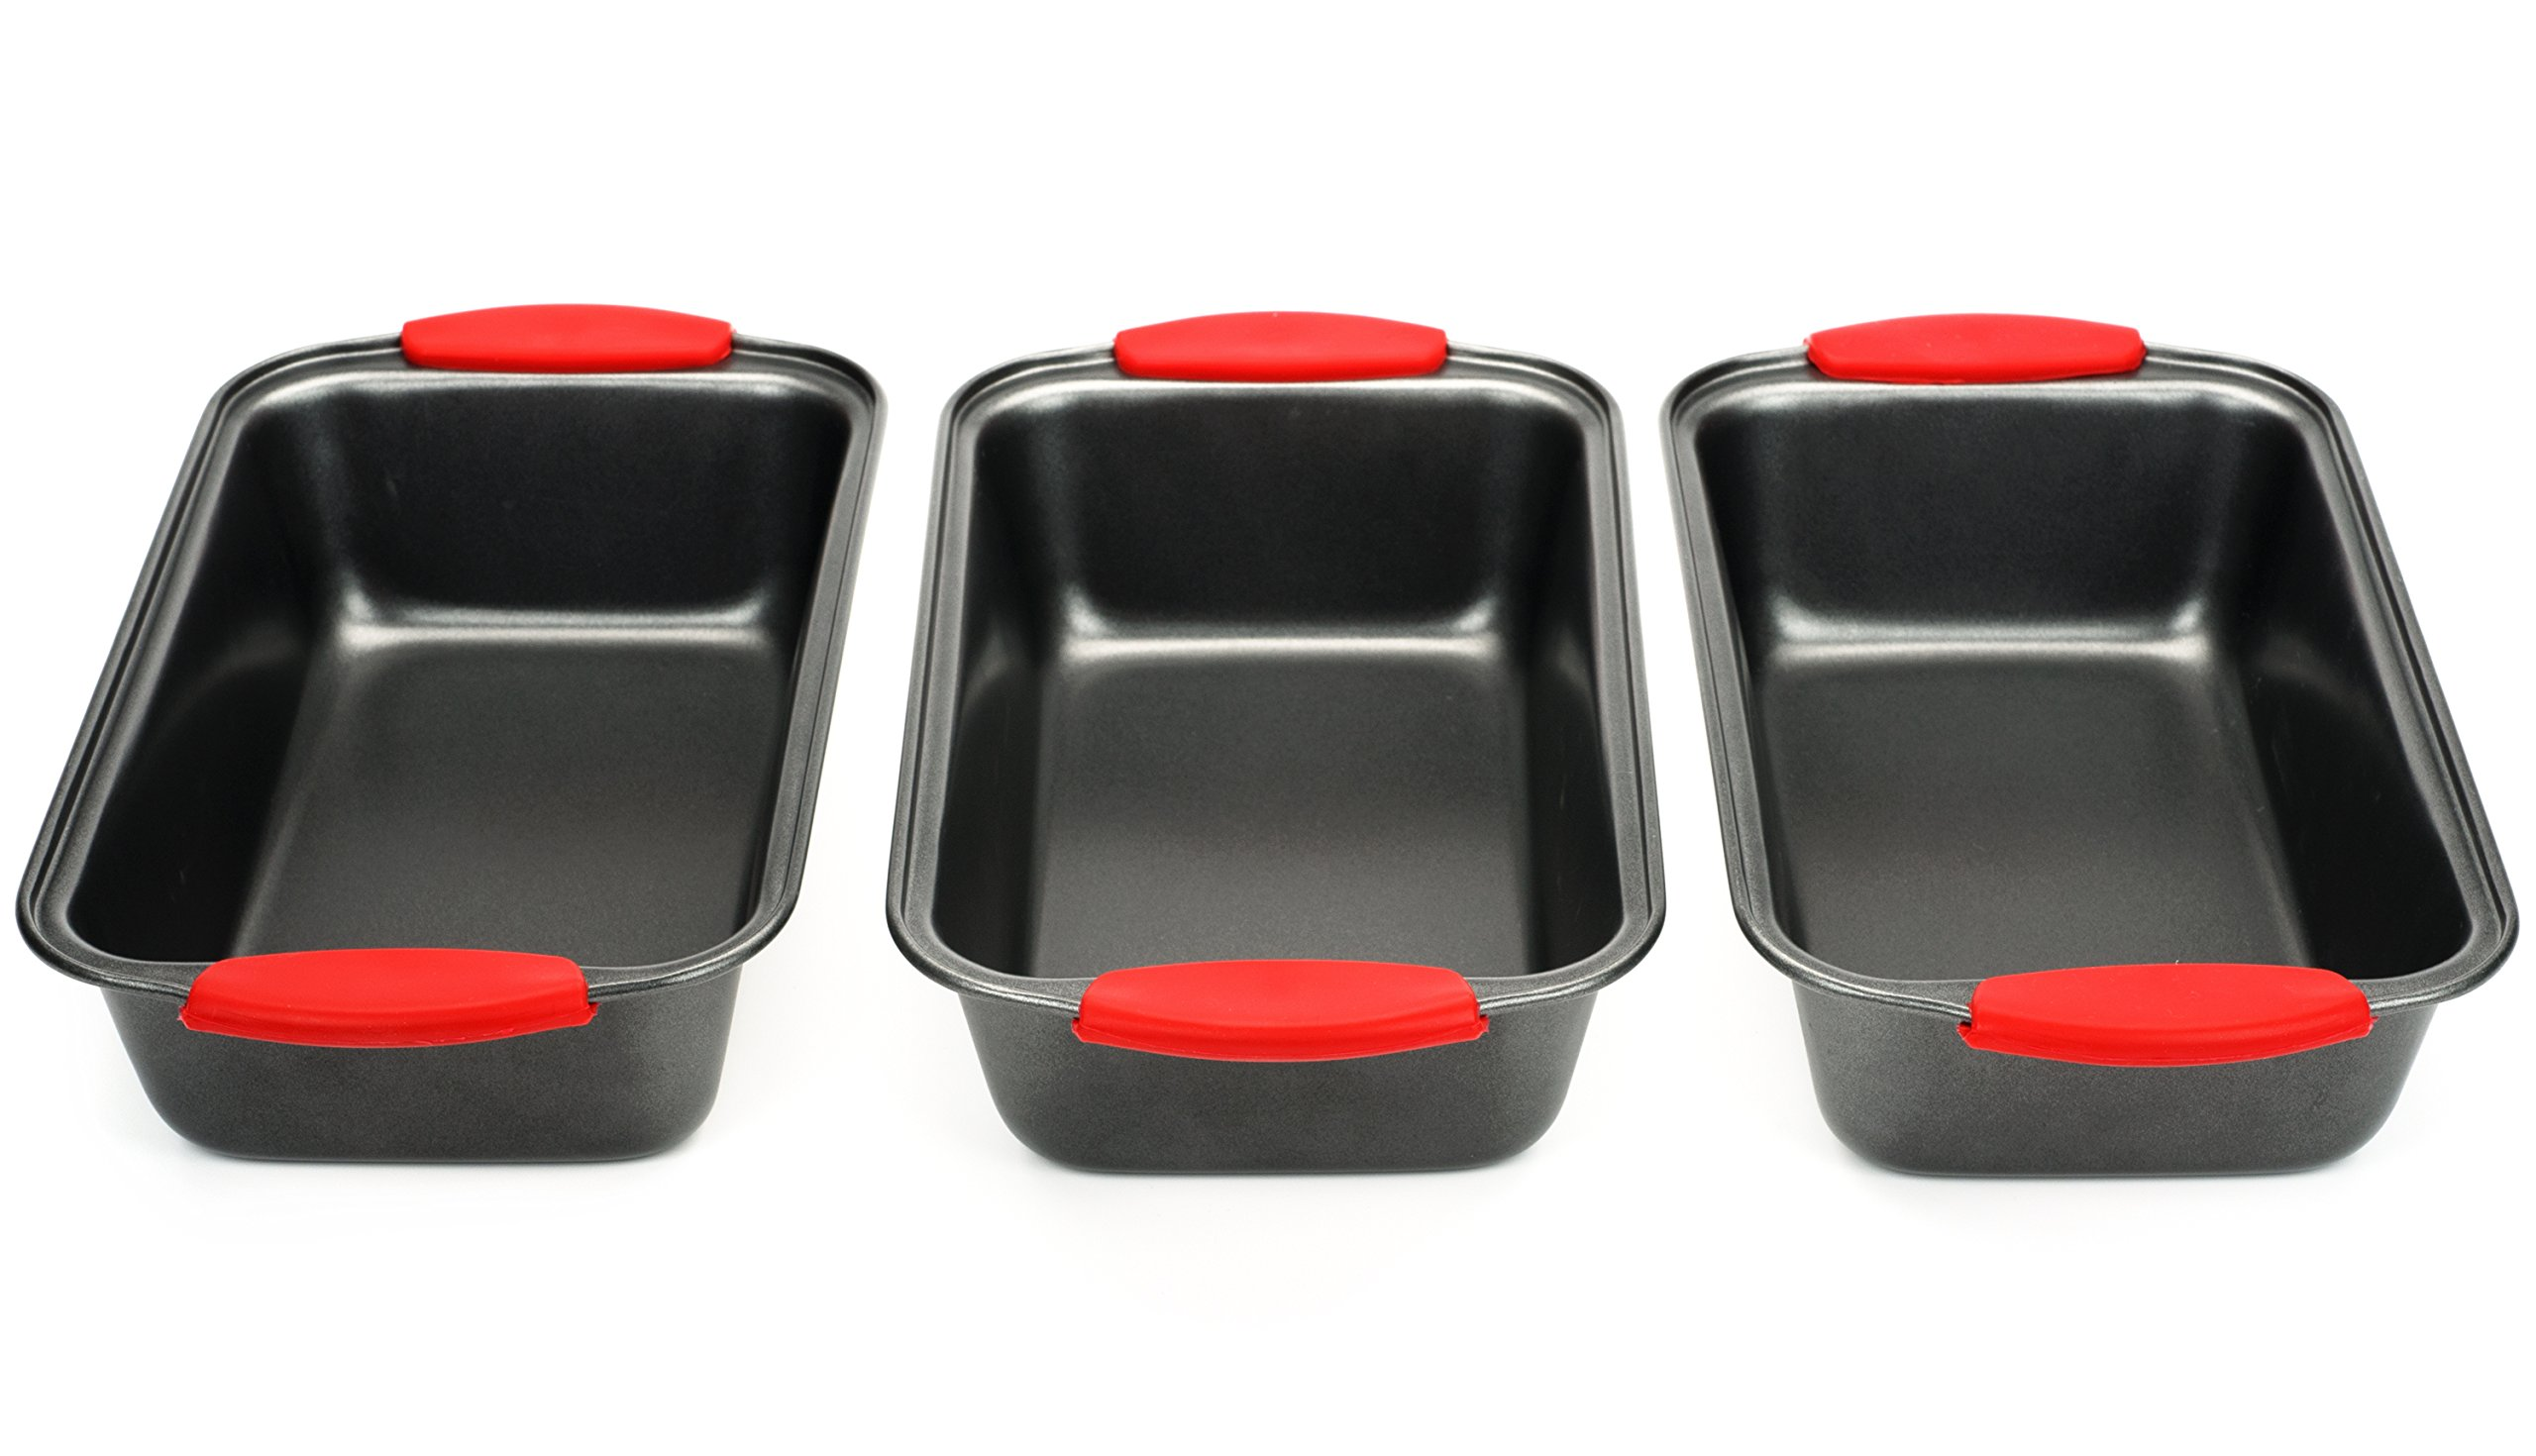 Elite Bakeware 3 Piece NonStick Bread Pan Set - Loaf Pans For Bread - Baking Pans - Bakeware Set by Elite Bakeware (Image #2)